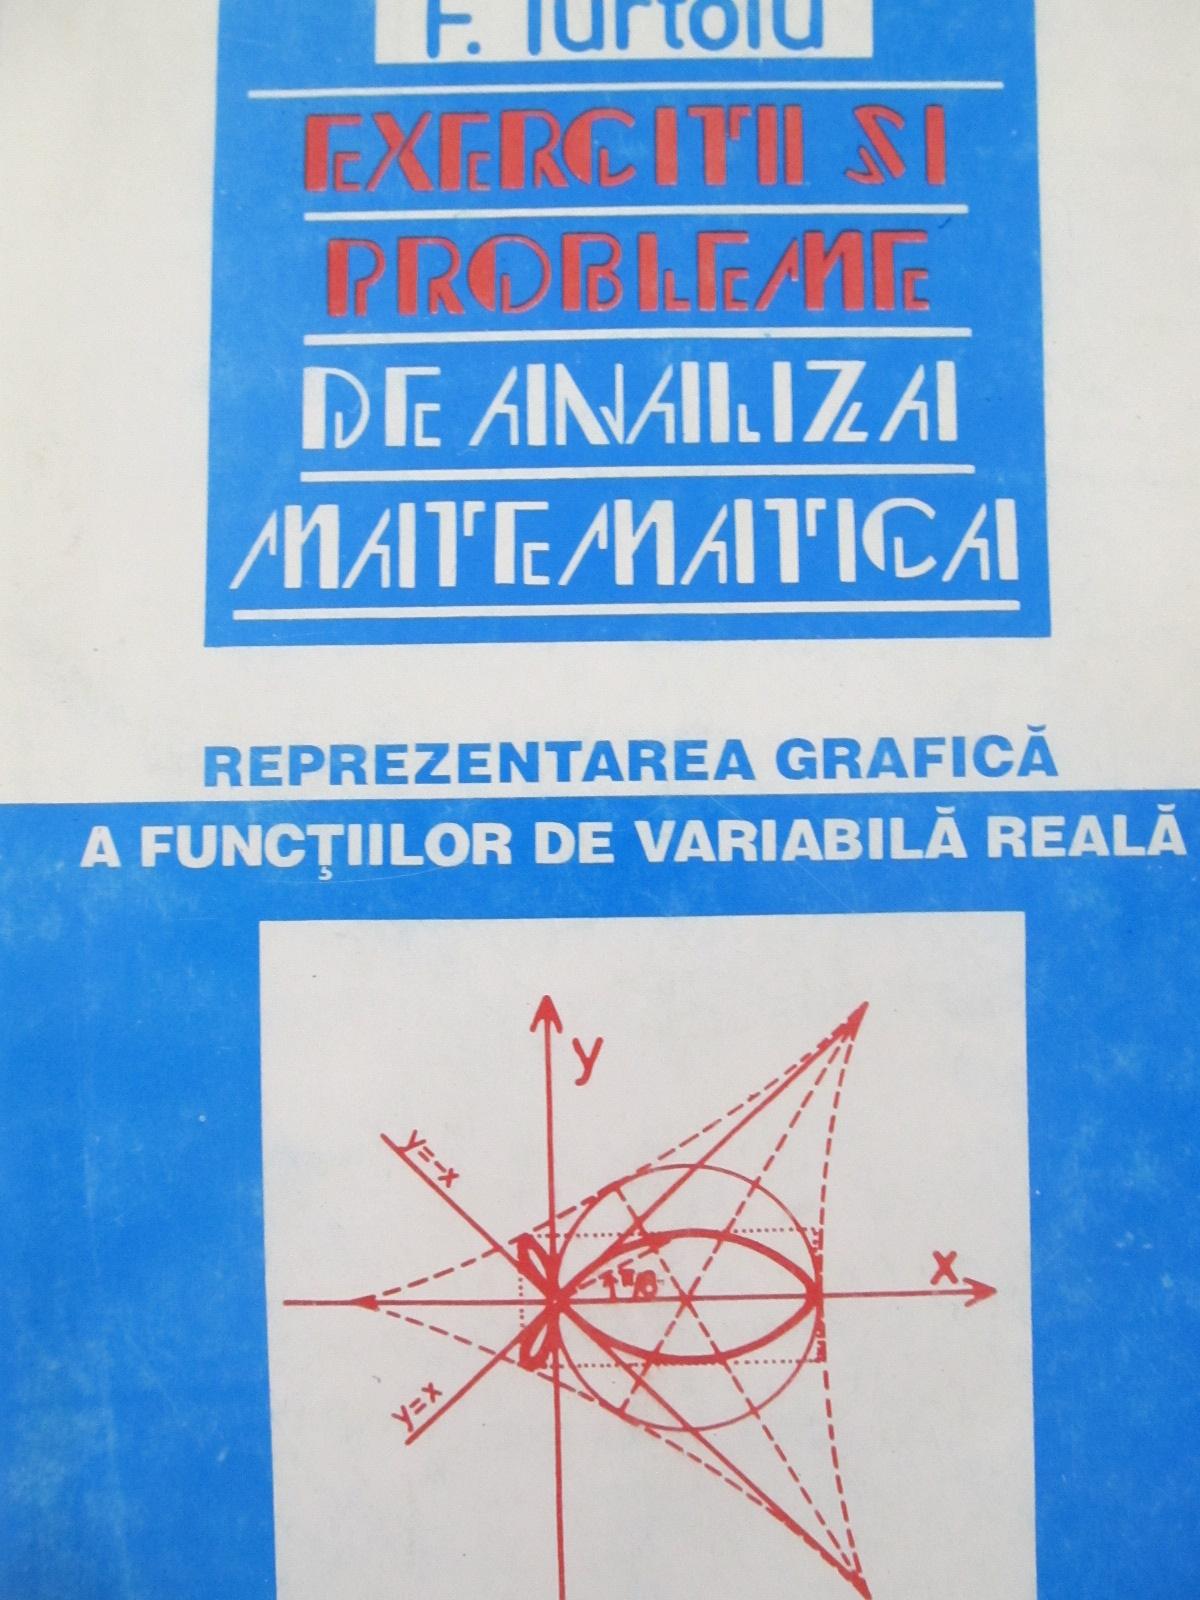 Exercitii si probleme de Analiza Matematica - Reprezentarea grafica a functiilor de variabila reala - F. Turtoiu | Detalii carte